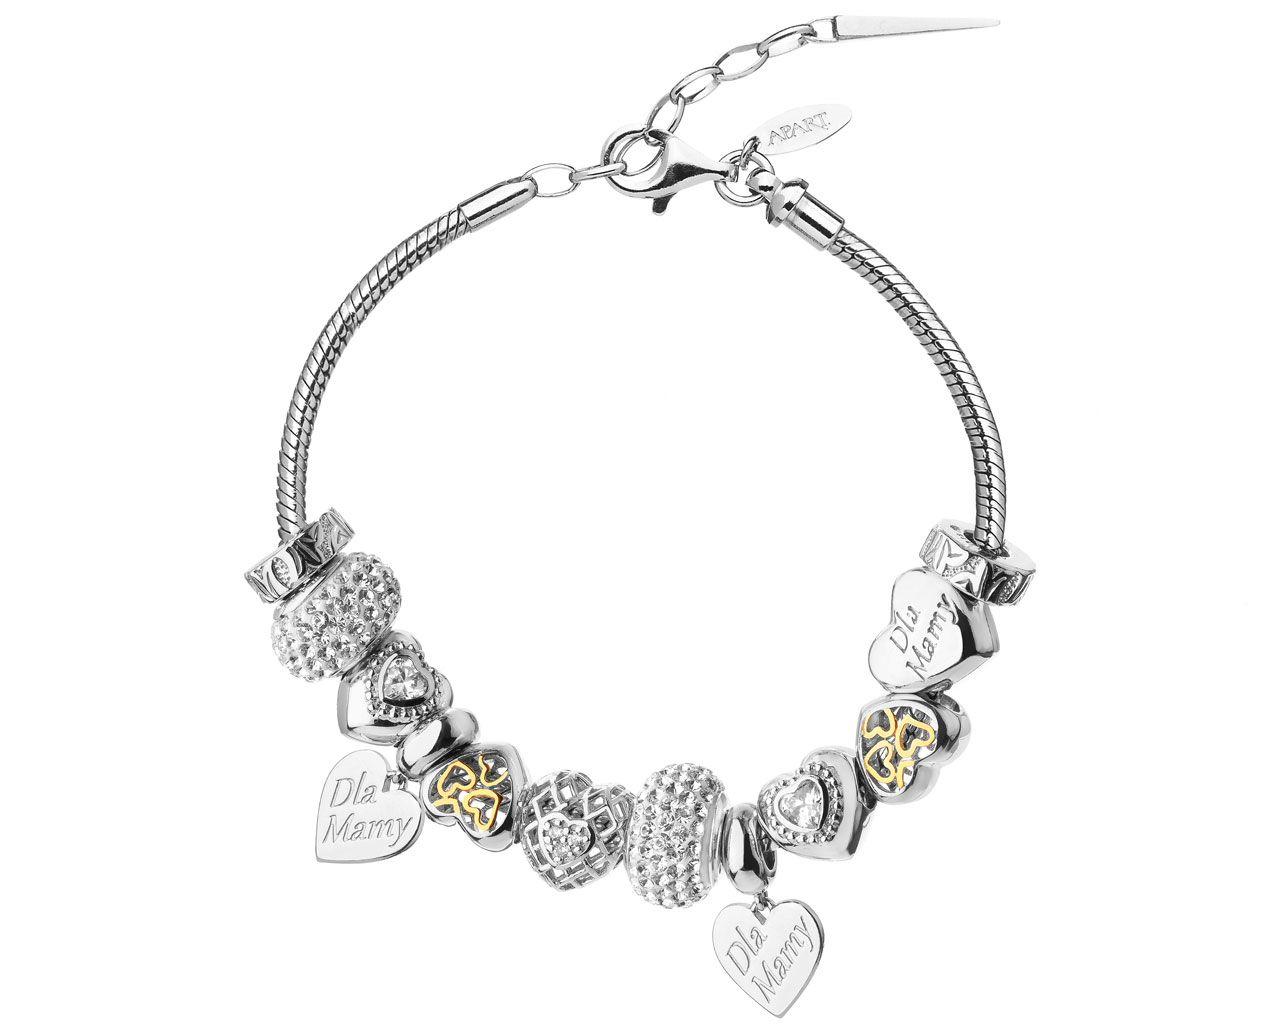 a9aec92eebbe40 Bransoleta beads #zloto #bizuteria #apart #bizuteriaapatrt #earring  #necklace #minimalist #gold #silver #flatlay #photography #jewelery  #instagram ...